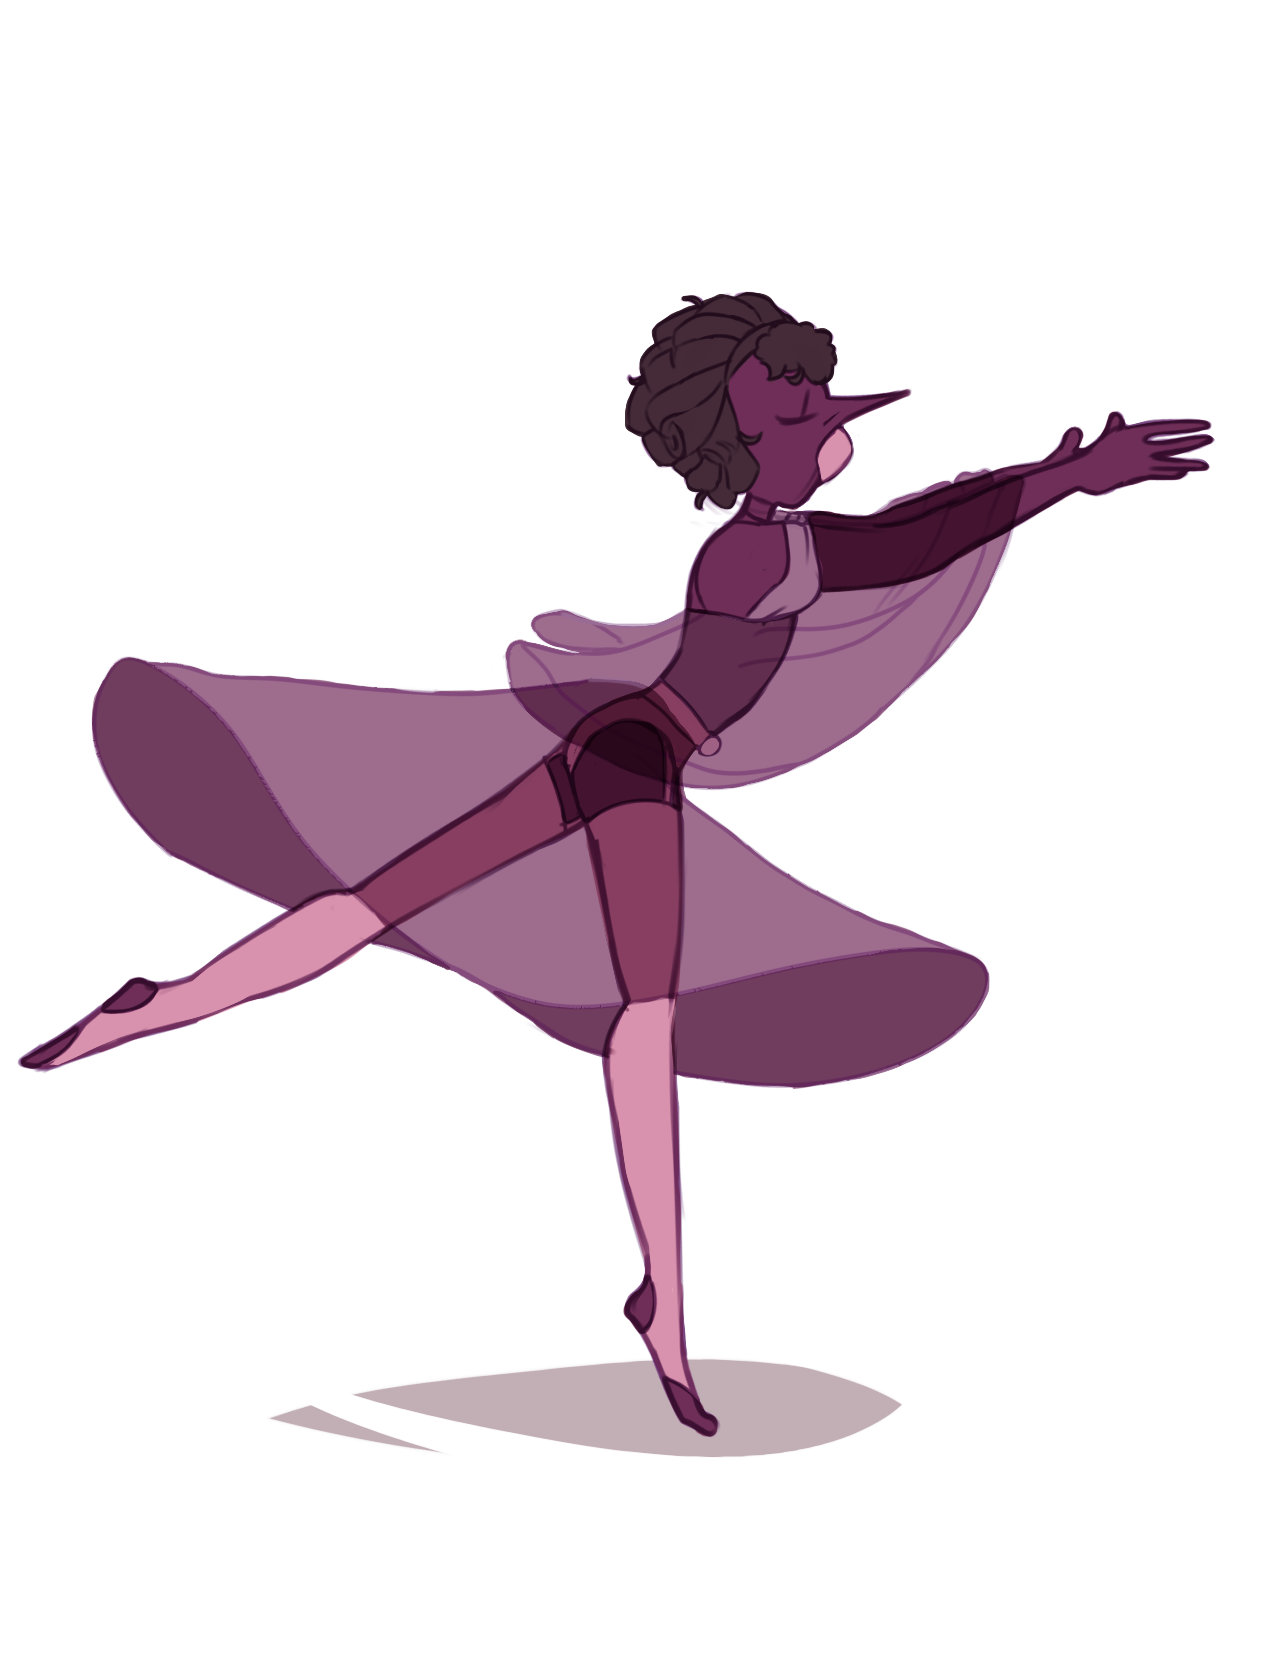 Dance by SmasherlovesBunny500